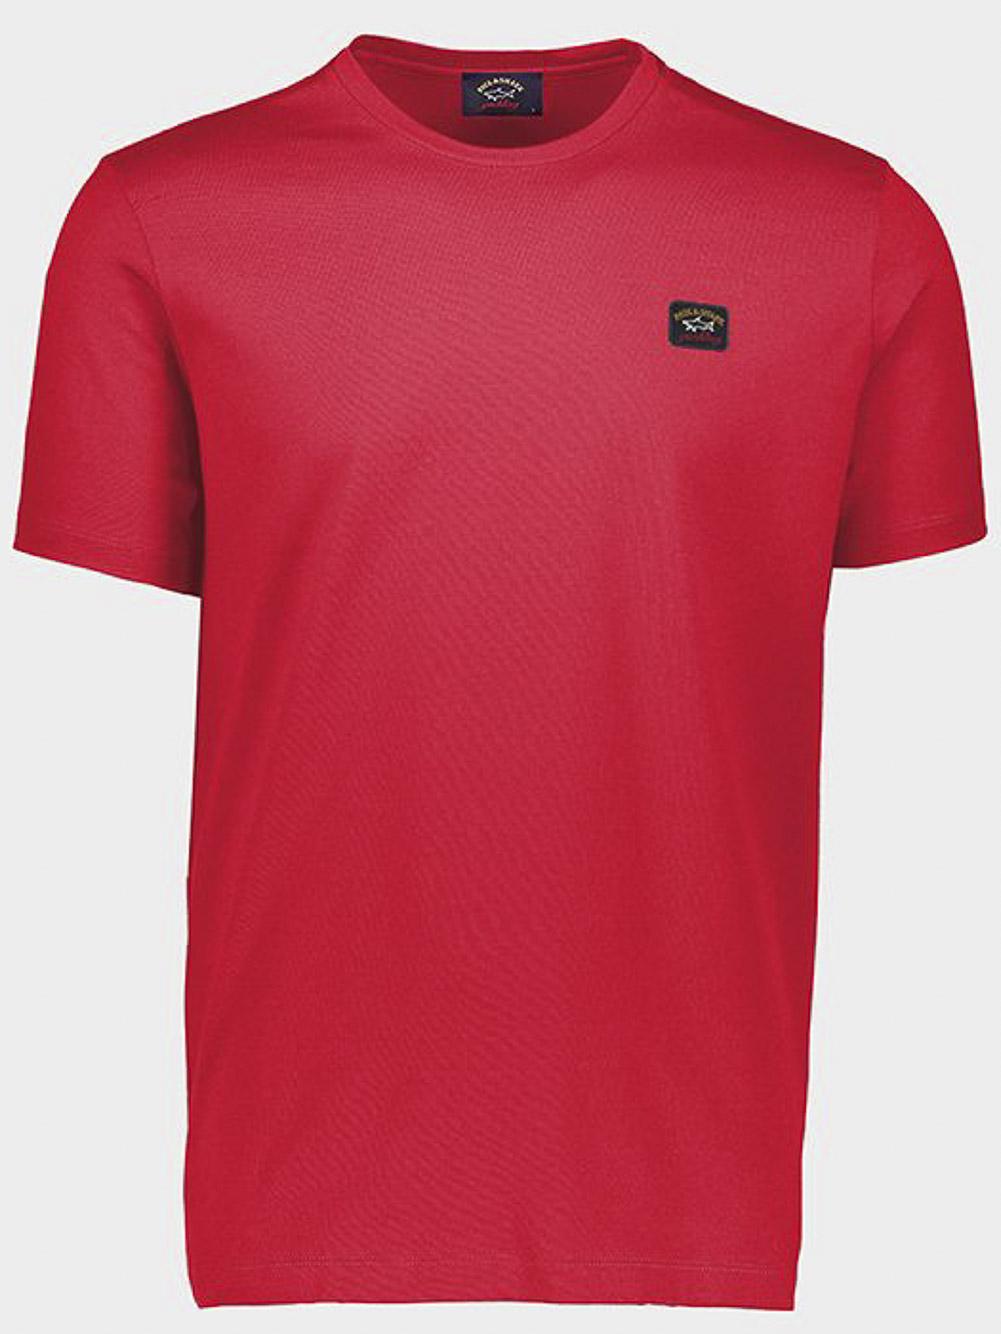 PAUL & SHARK Μπλούζα T-Shirt COP1002-356 ΚΟΡΑΛΙ